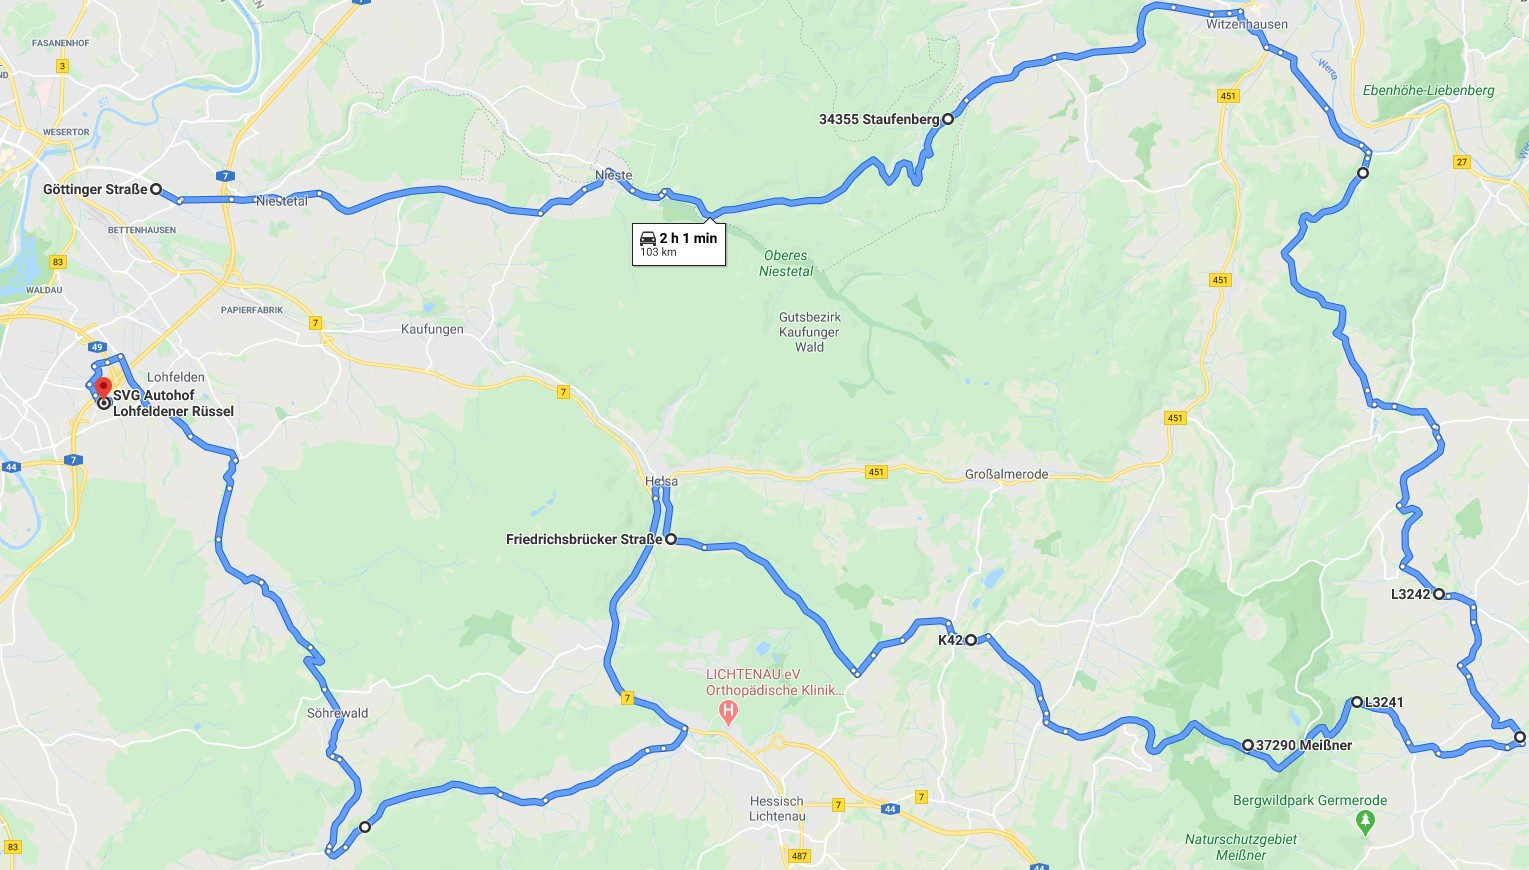 Route_Witzenhausen-Hoher_Mei%C3%9Fner_2020-08-02.jpg